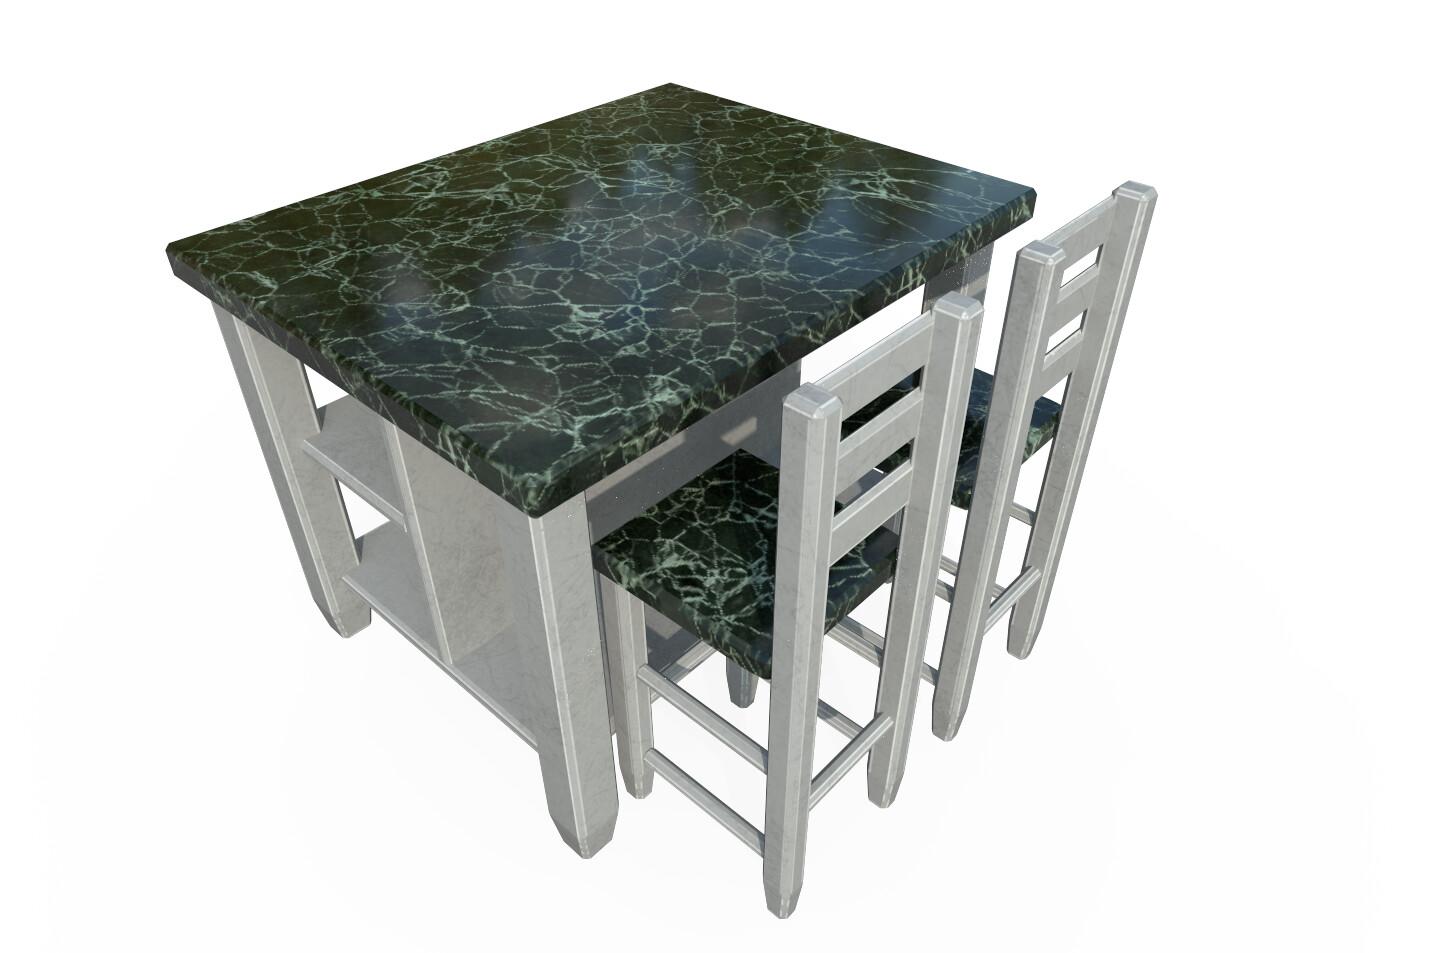 Joseph moniz breakfasttable001e